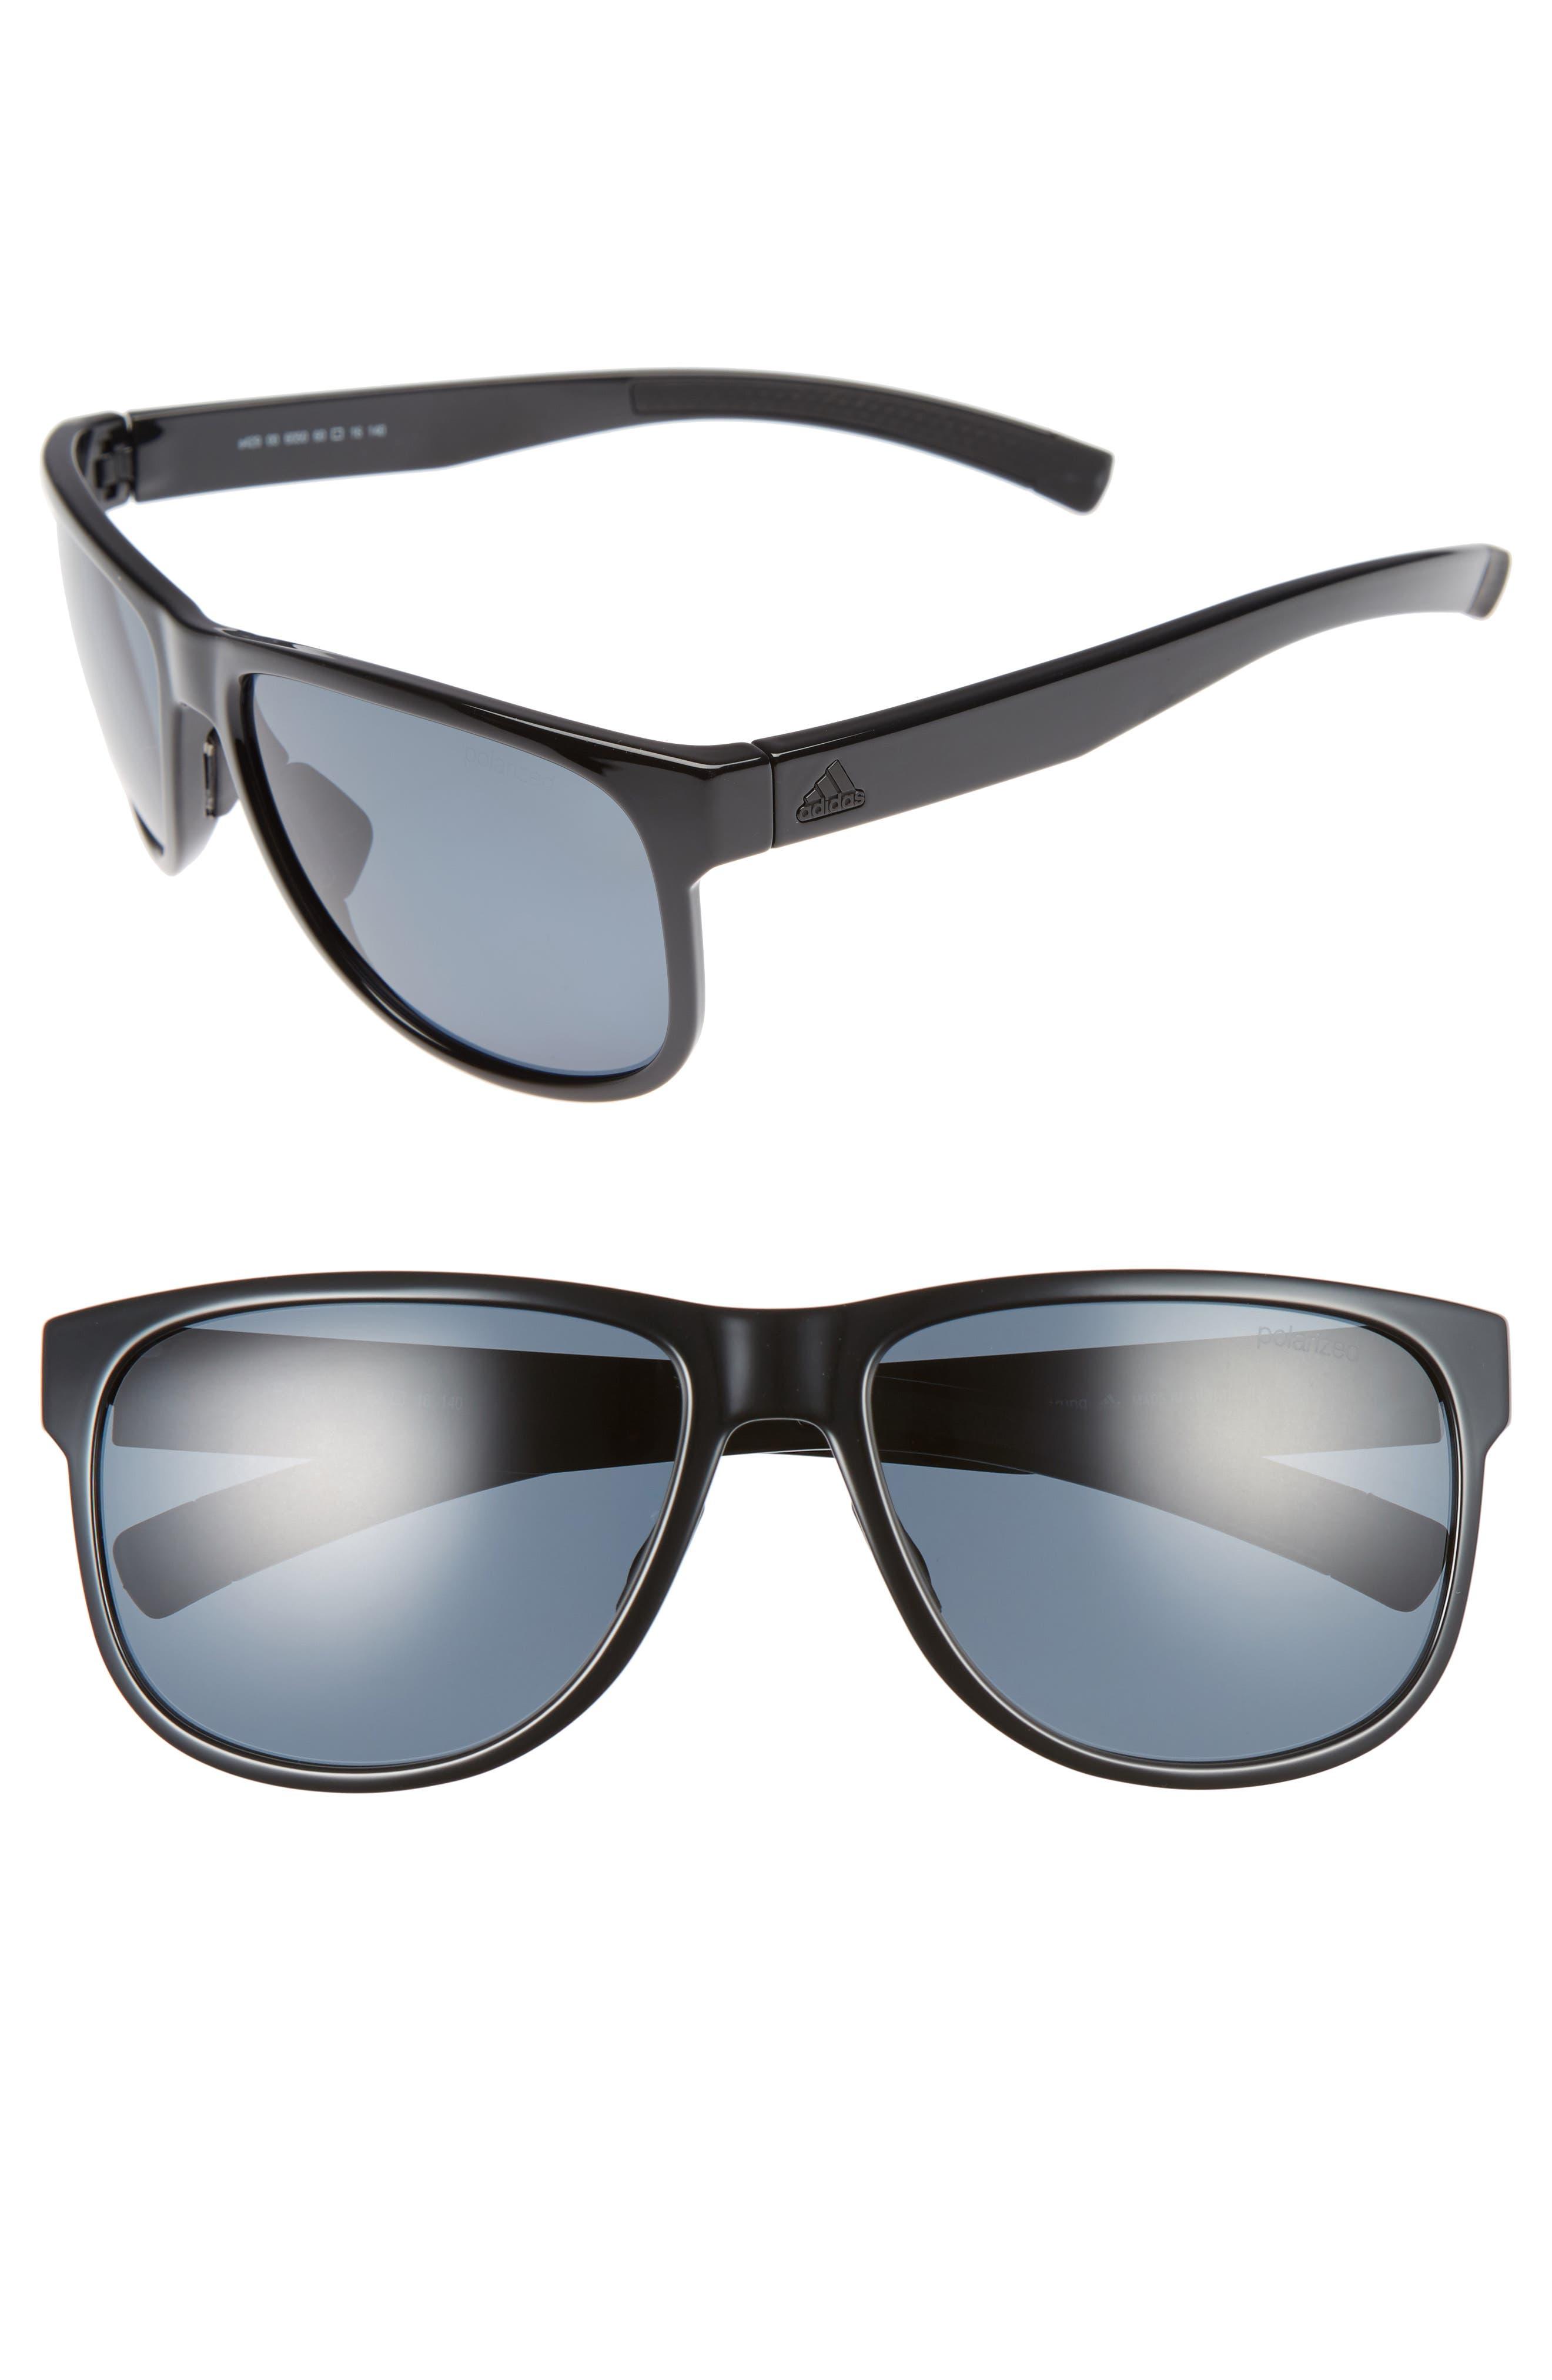 Sprung 60mm Sunglasses,                             Main thumbnail 1, color,                             SHINY BLACK/ GREY POLAR